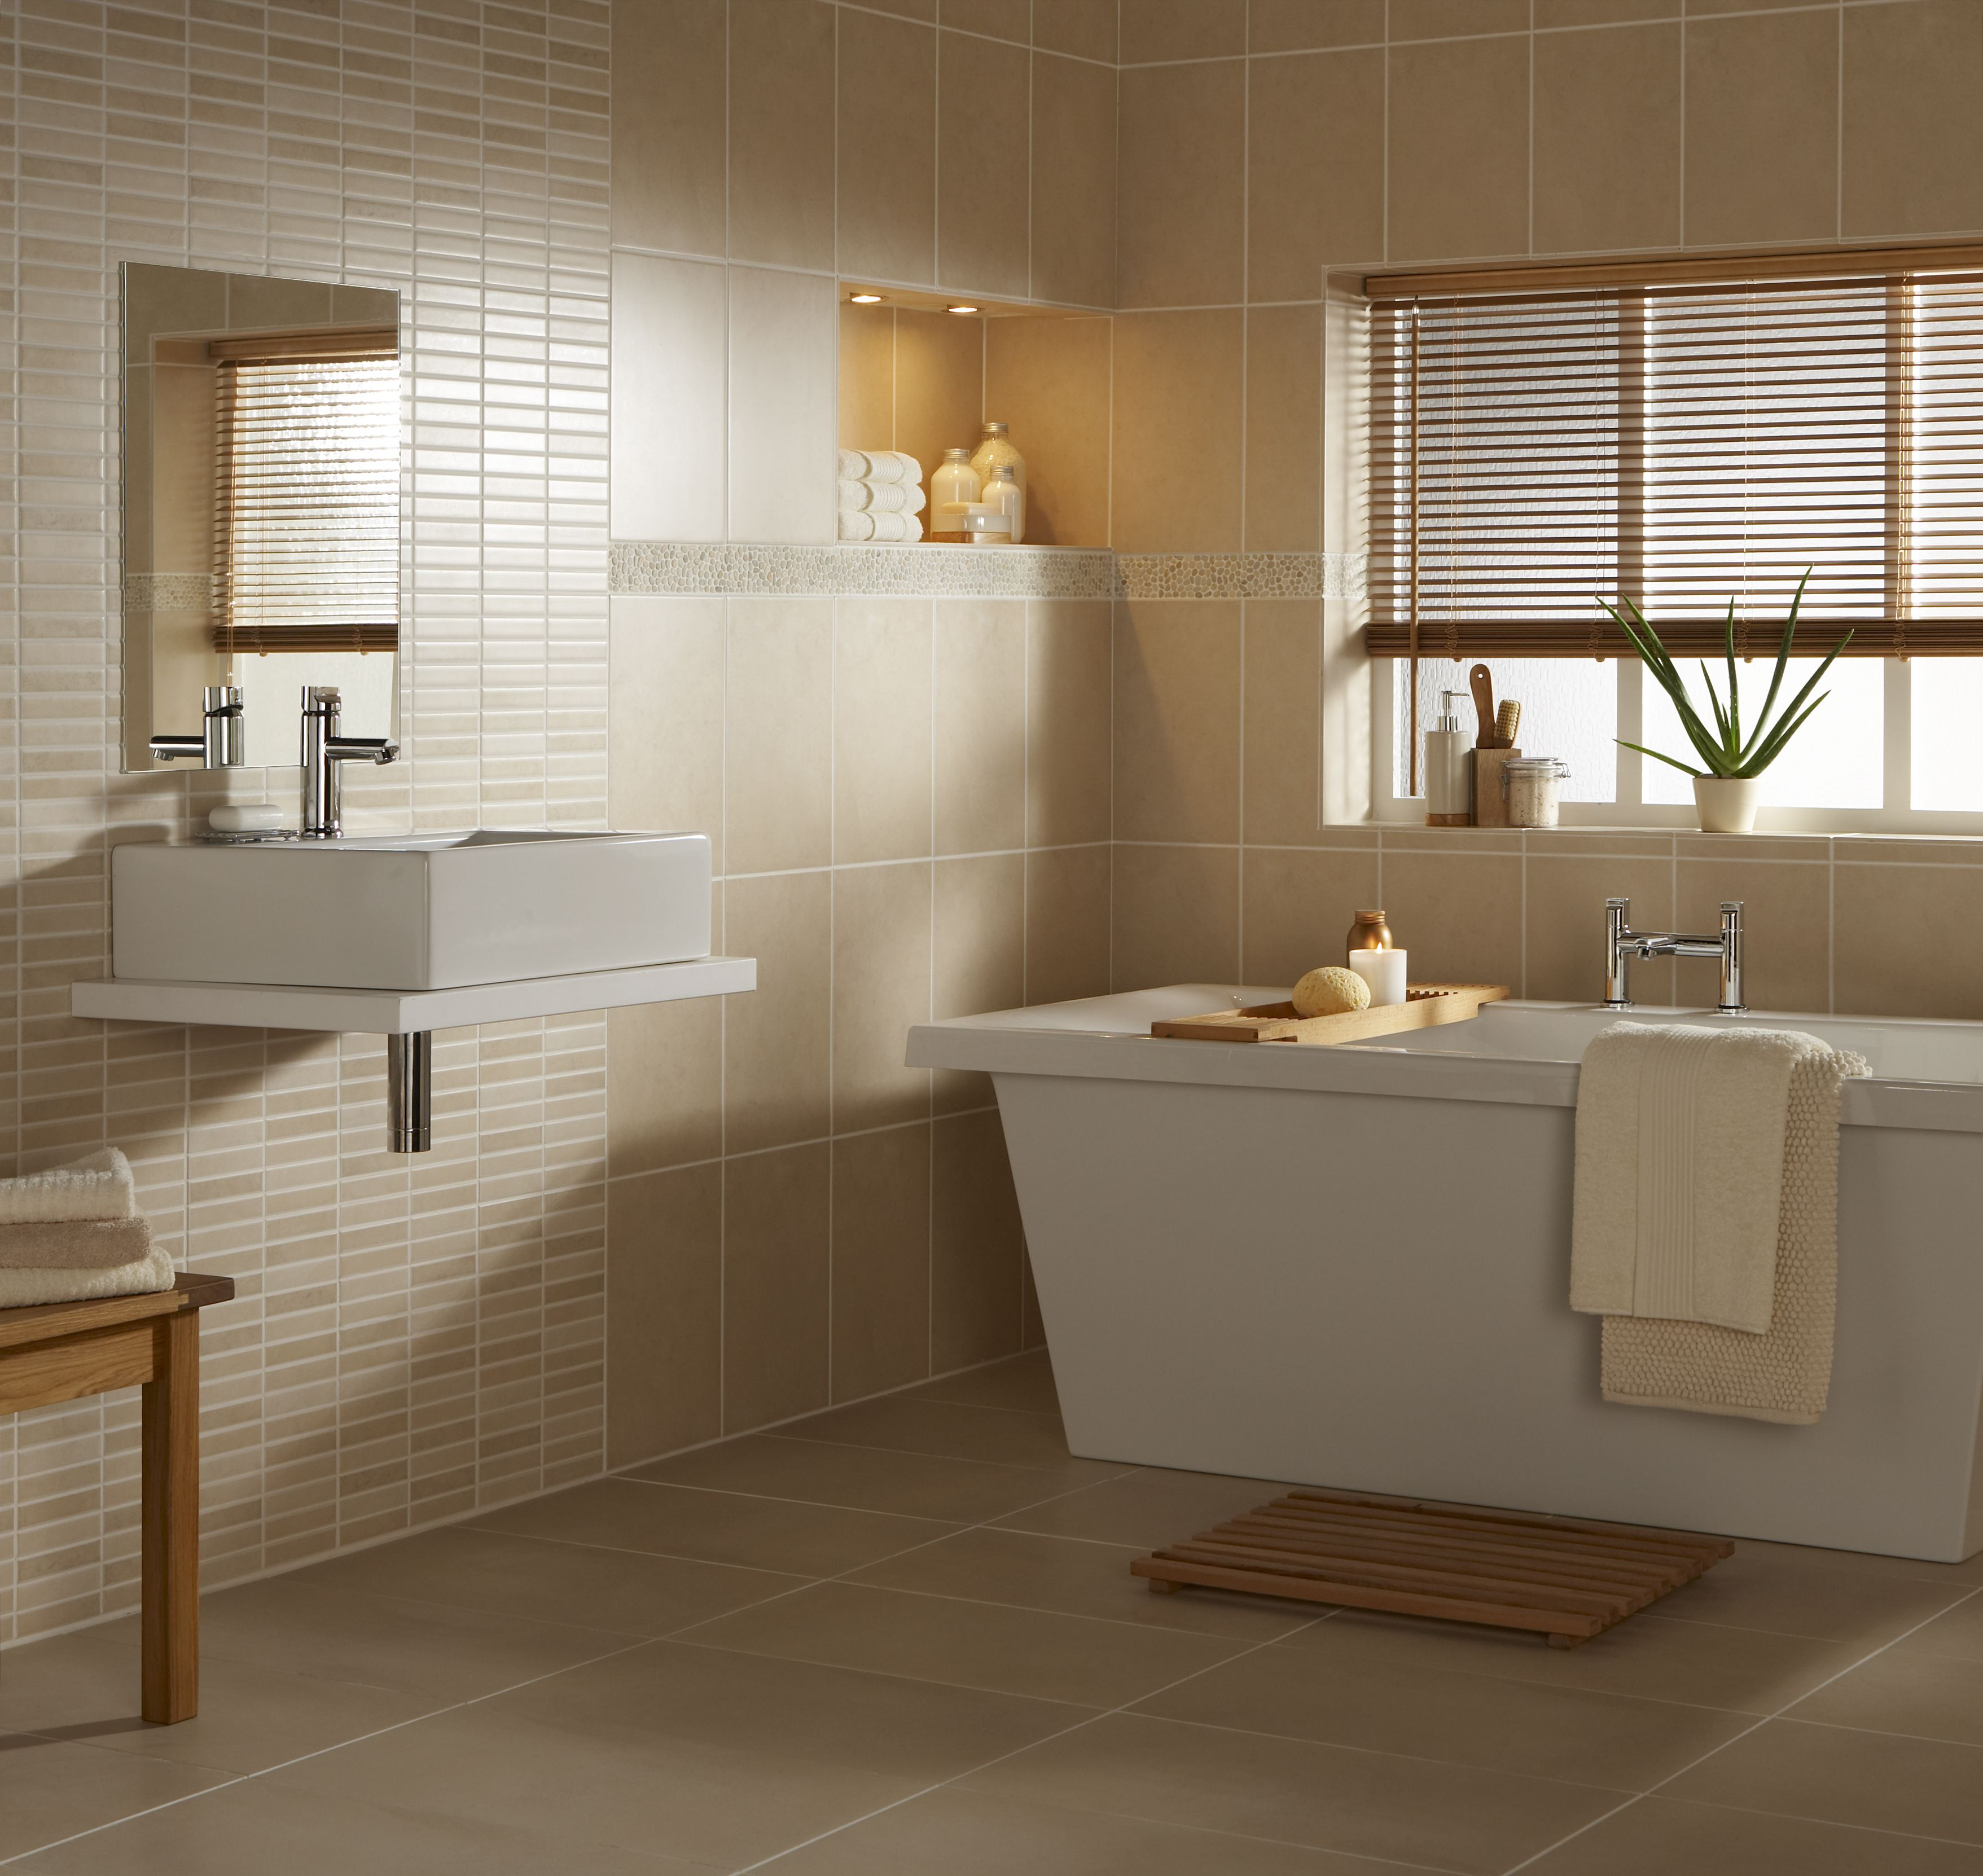 Malvern Beige Ceramic Wall Tile 248x398mm - Tons of Tiles - Metro ...